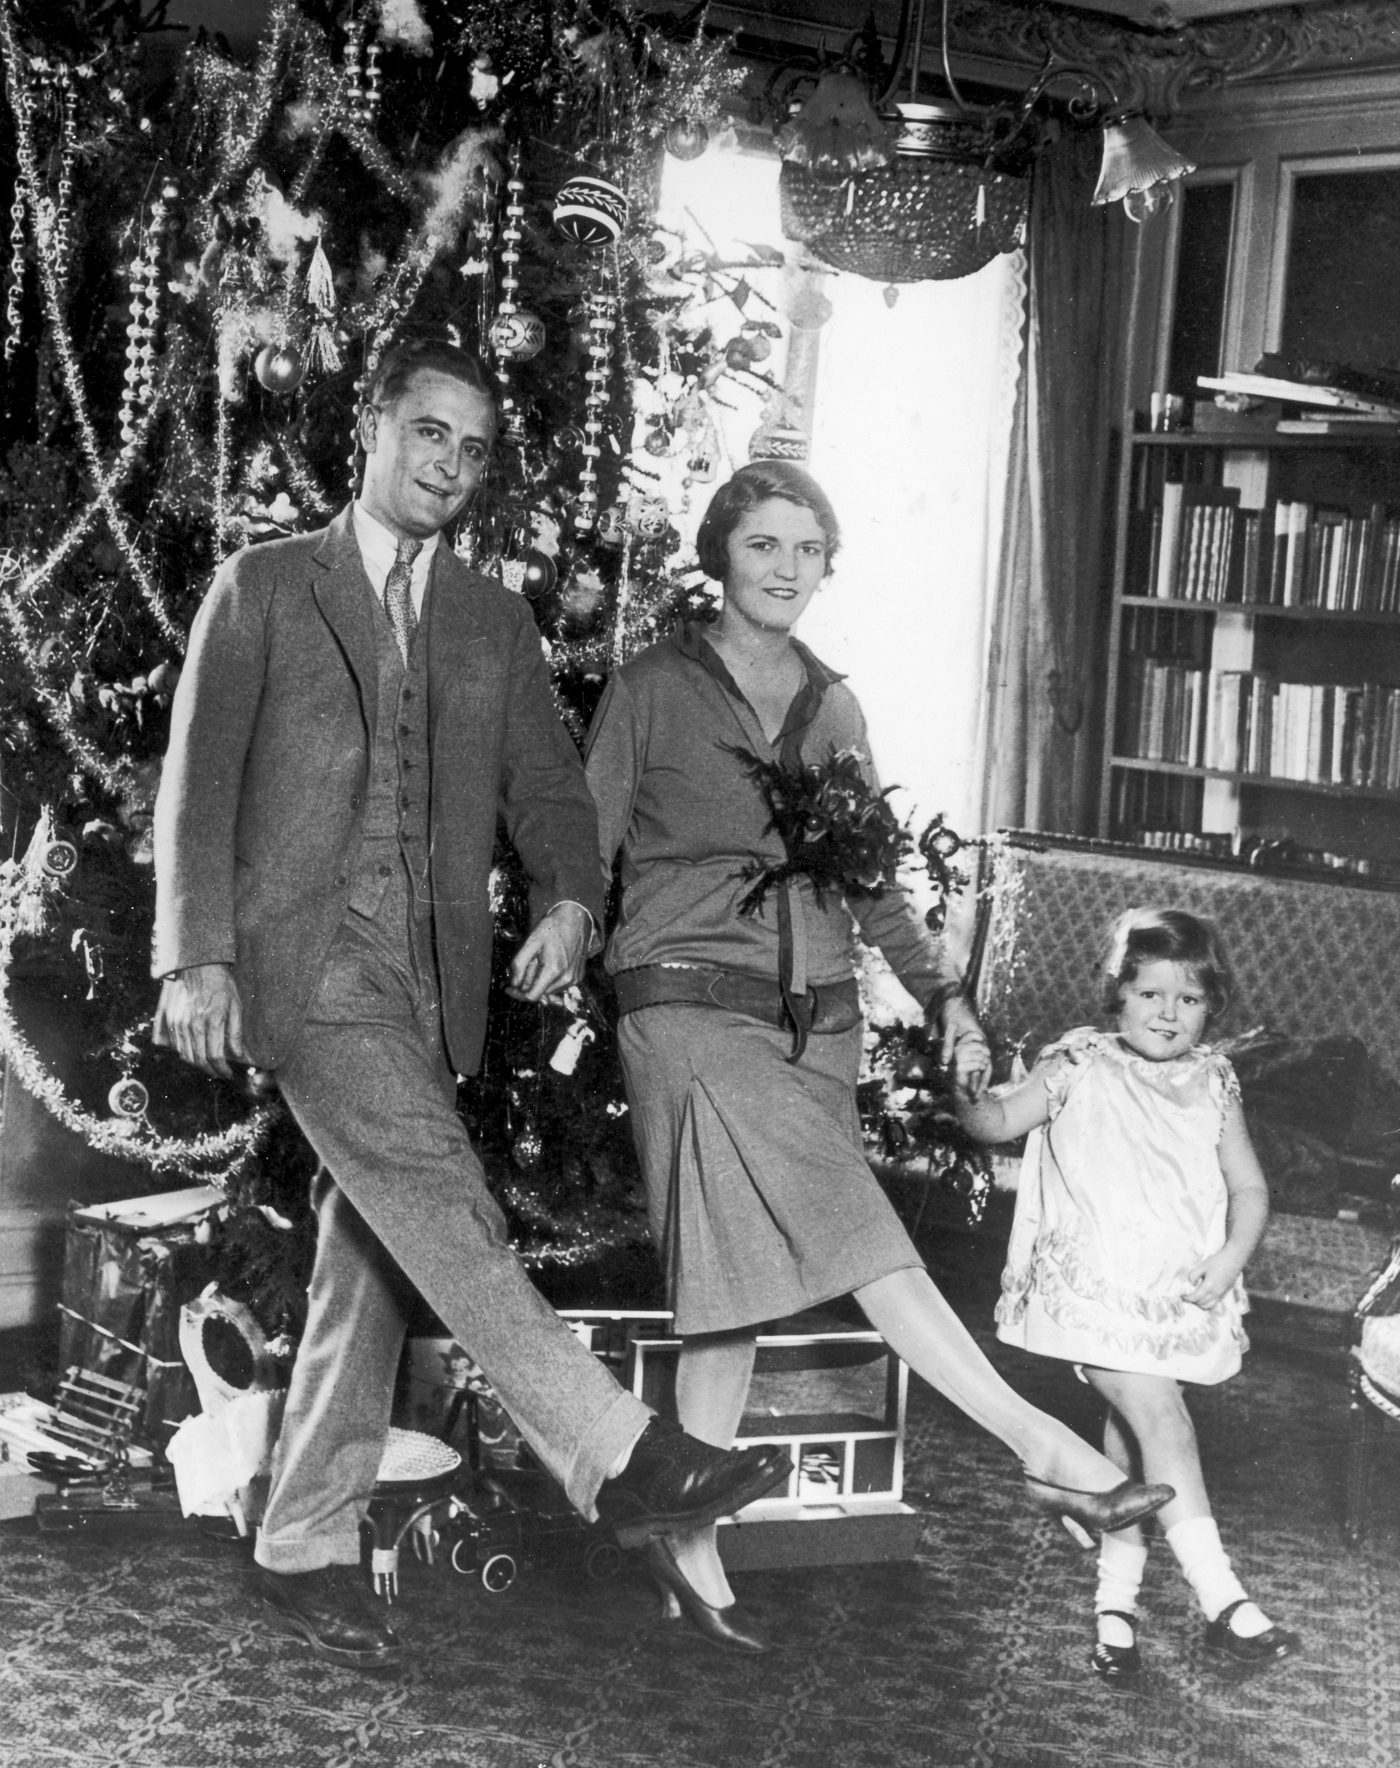 F Scott Fitzgerald Daughter Interview: Therese Ann...